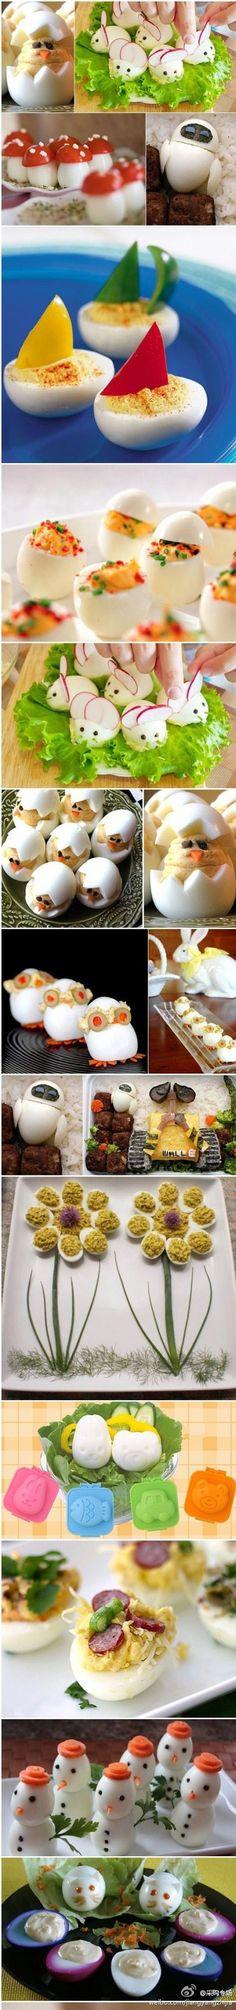 health benefits of eggs essen fingerfood abendbrot und lustig essen. Black Bedroom Furniture Sets. Home Design Ideas